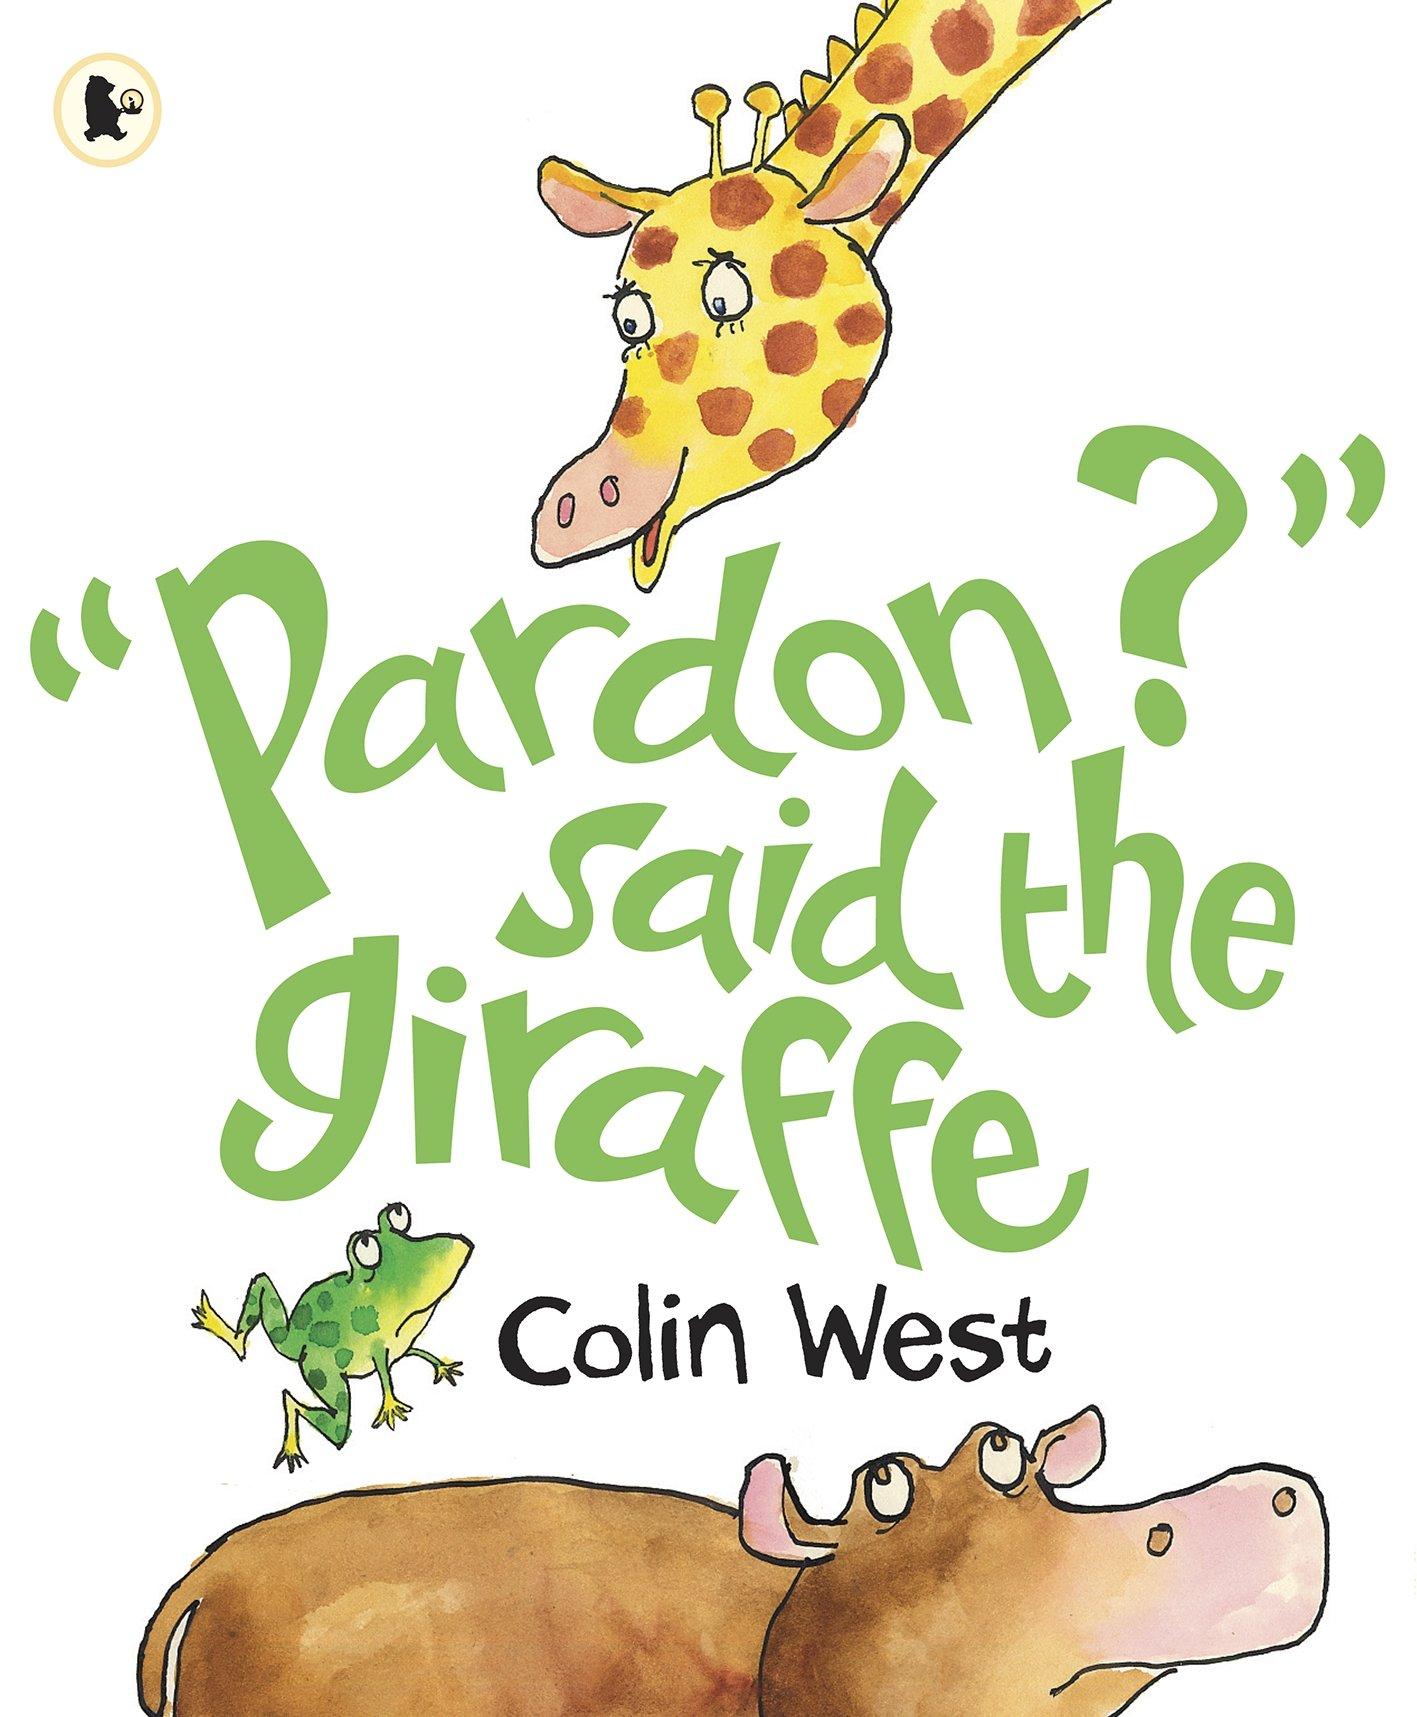 pardon said the giraffe colin west 9781406321043 amazon com books